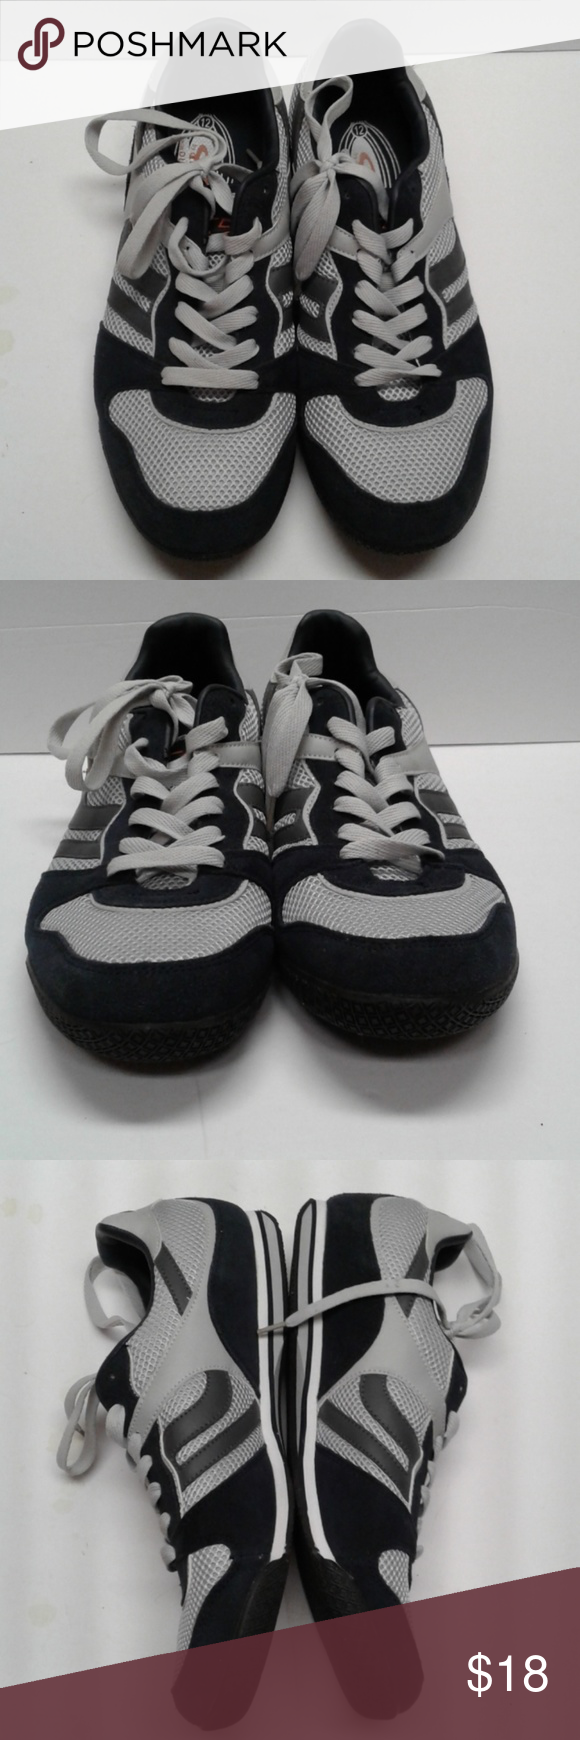 f985c50abb1f Champion 12 athletic shoes men s Aider Champion Aider Duo Dry style  athletic shoes. Leather